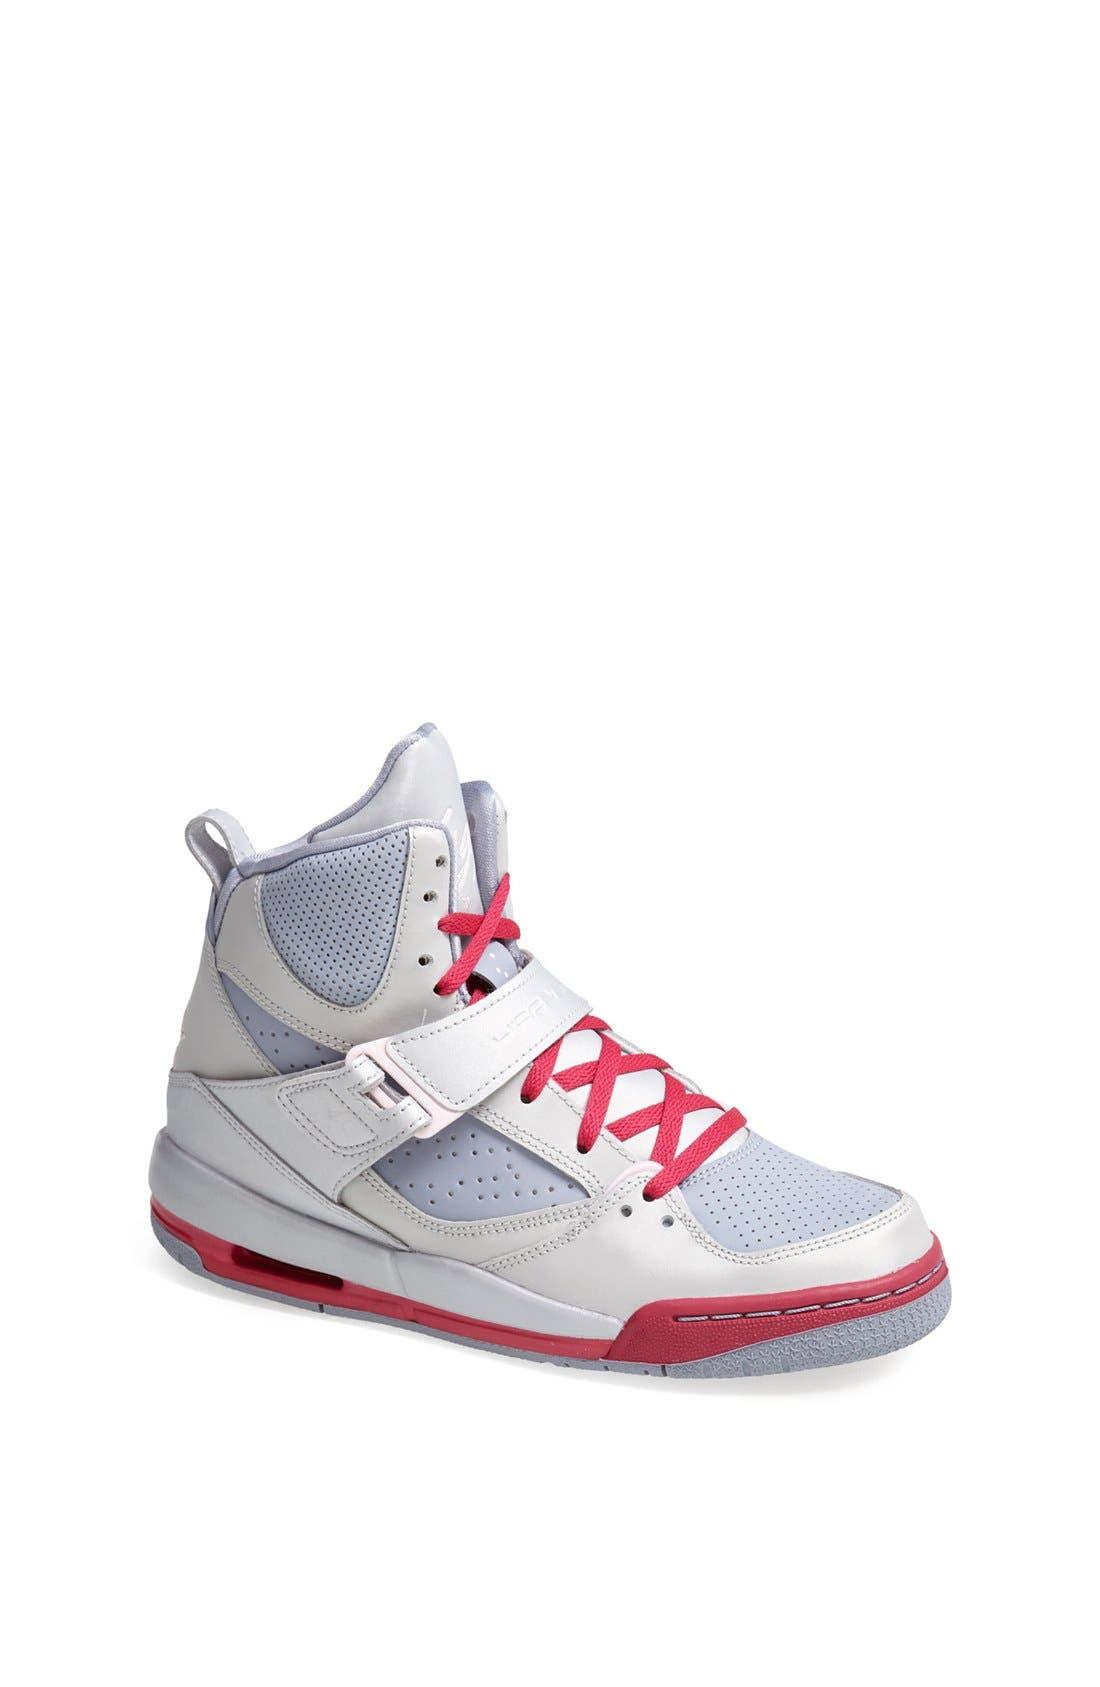 Main Image - Nike 'Jordan Flight 45' High Athletic Shoe (Big Kid)